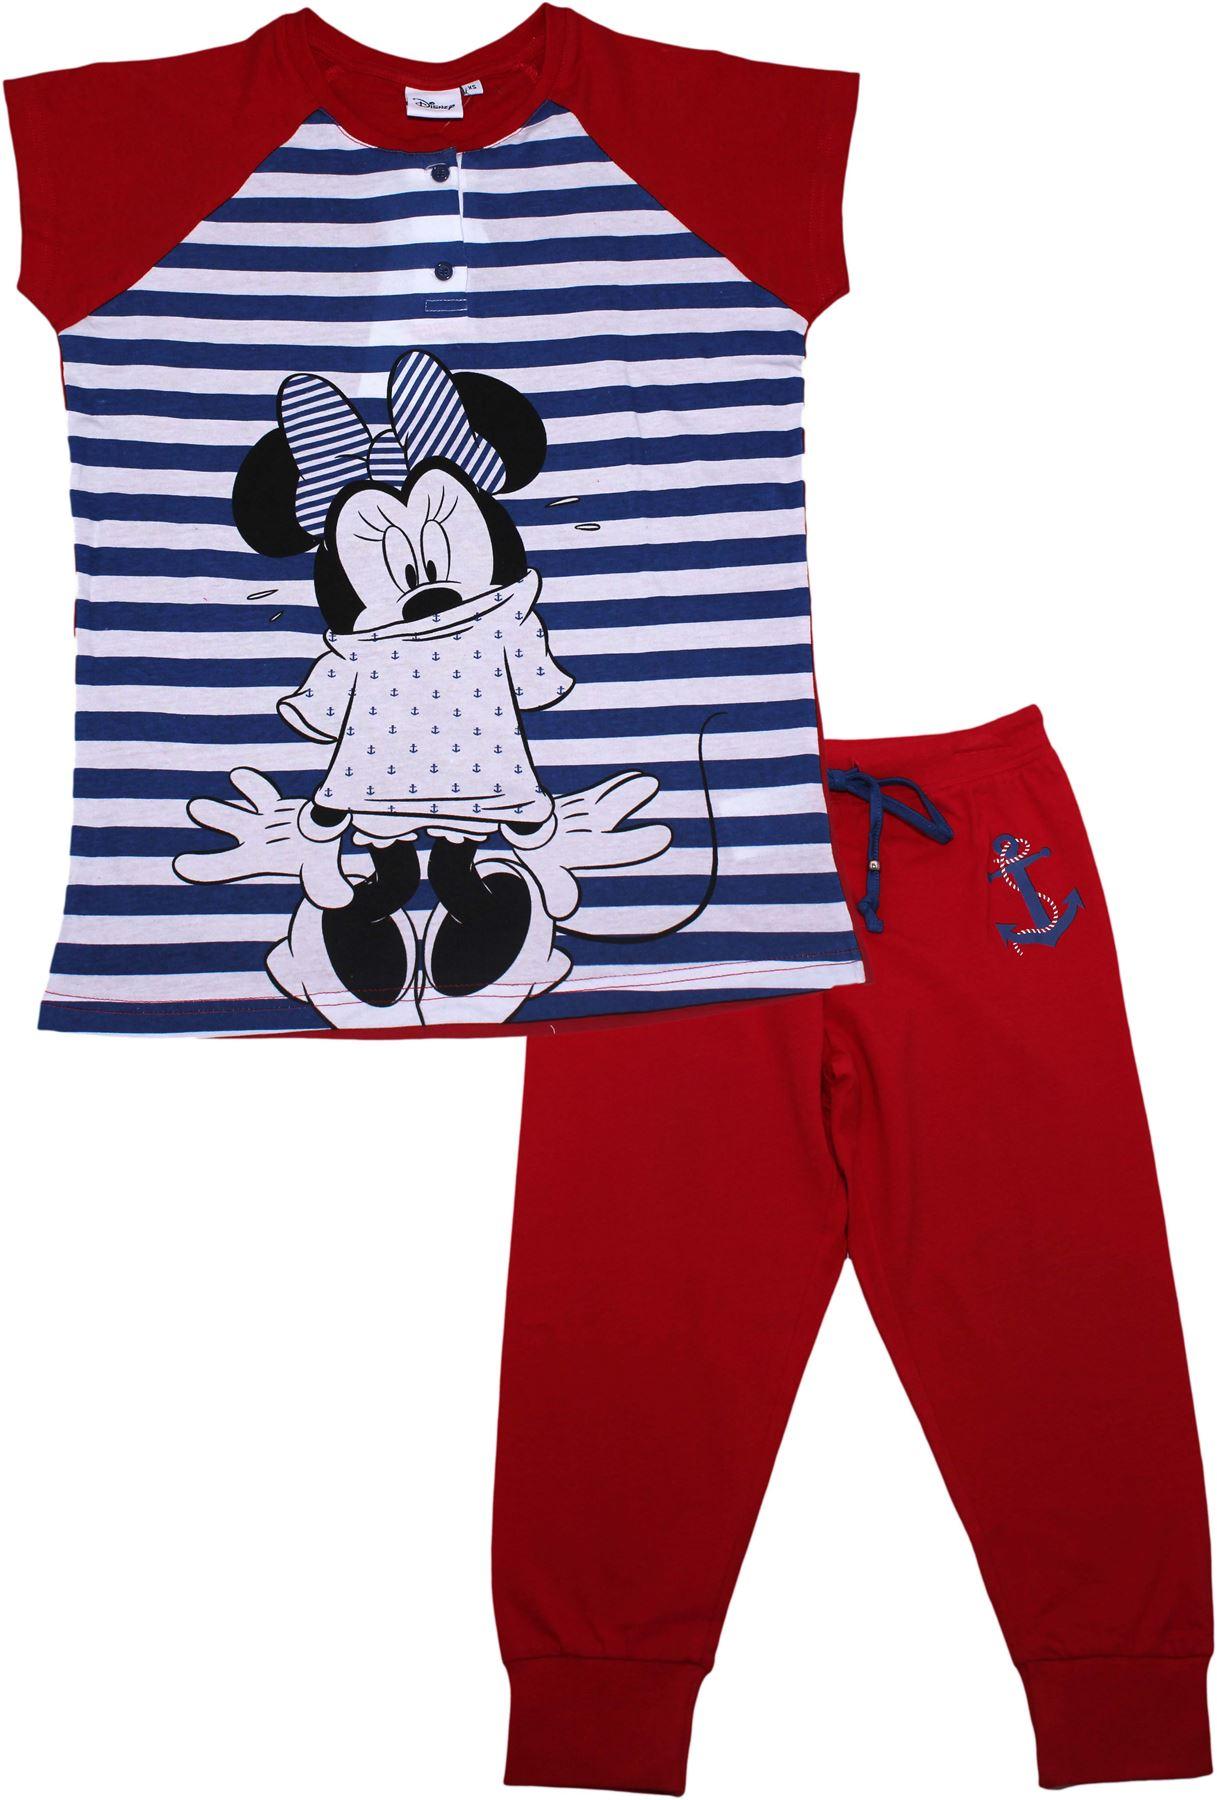 Womens Official Disney Minnie Mouse Short Sleeve Pyjamas Loungewear ...